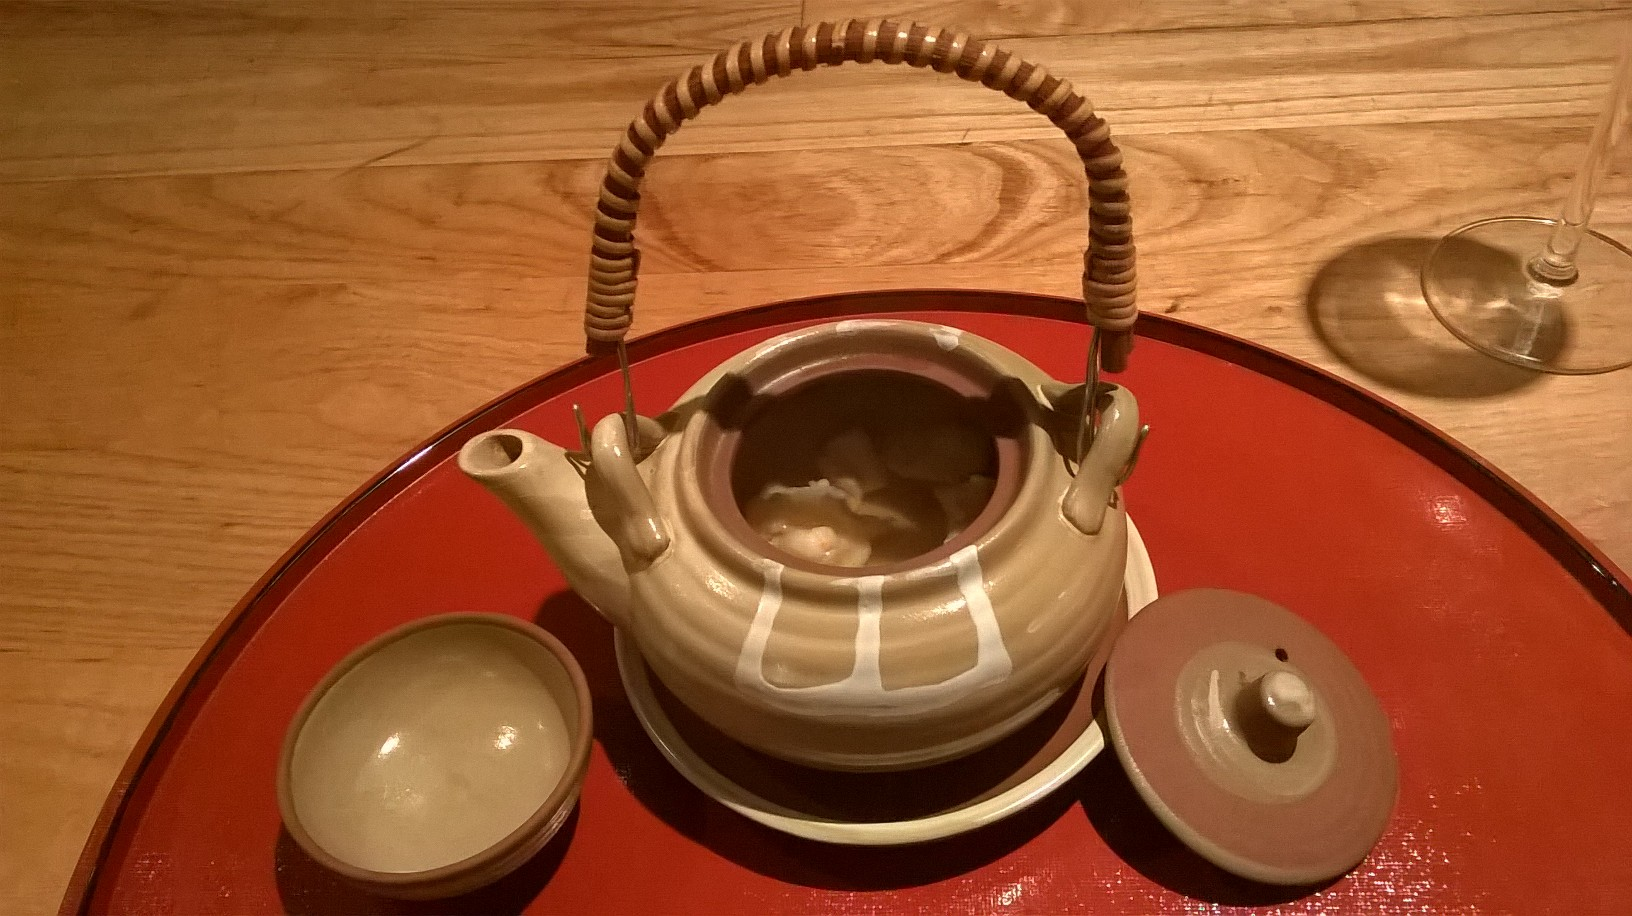 Japanese cuisine Yama - teapot